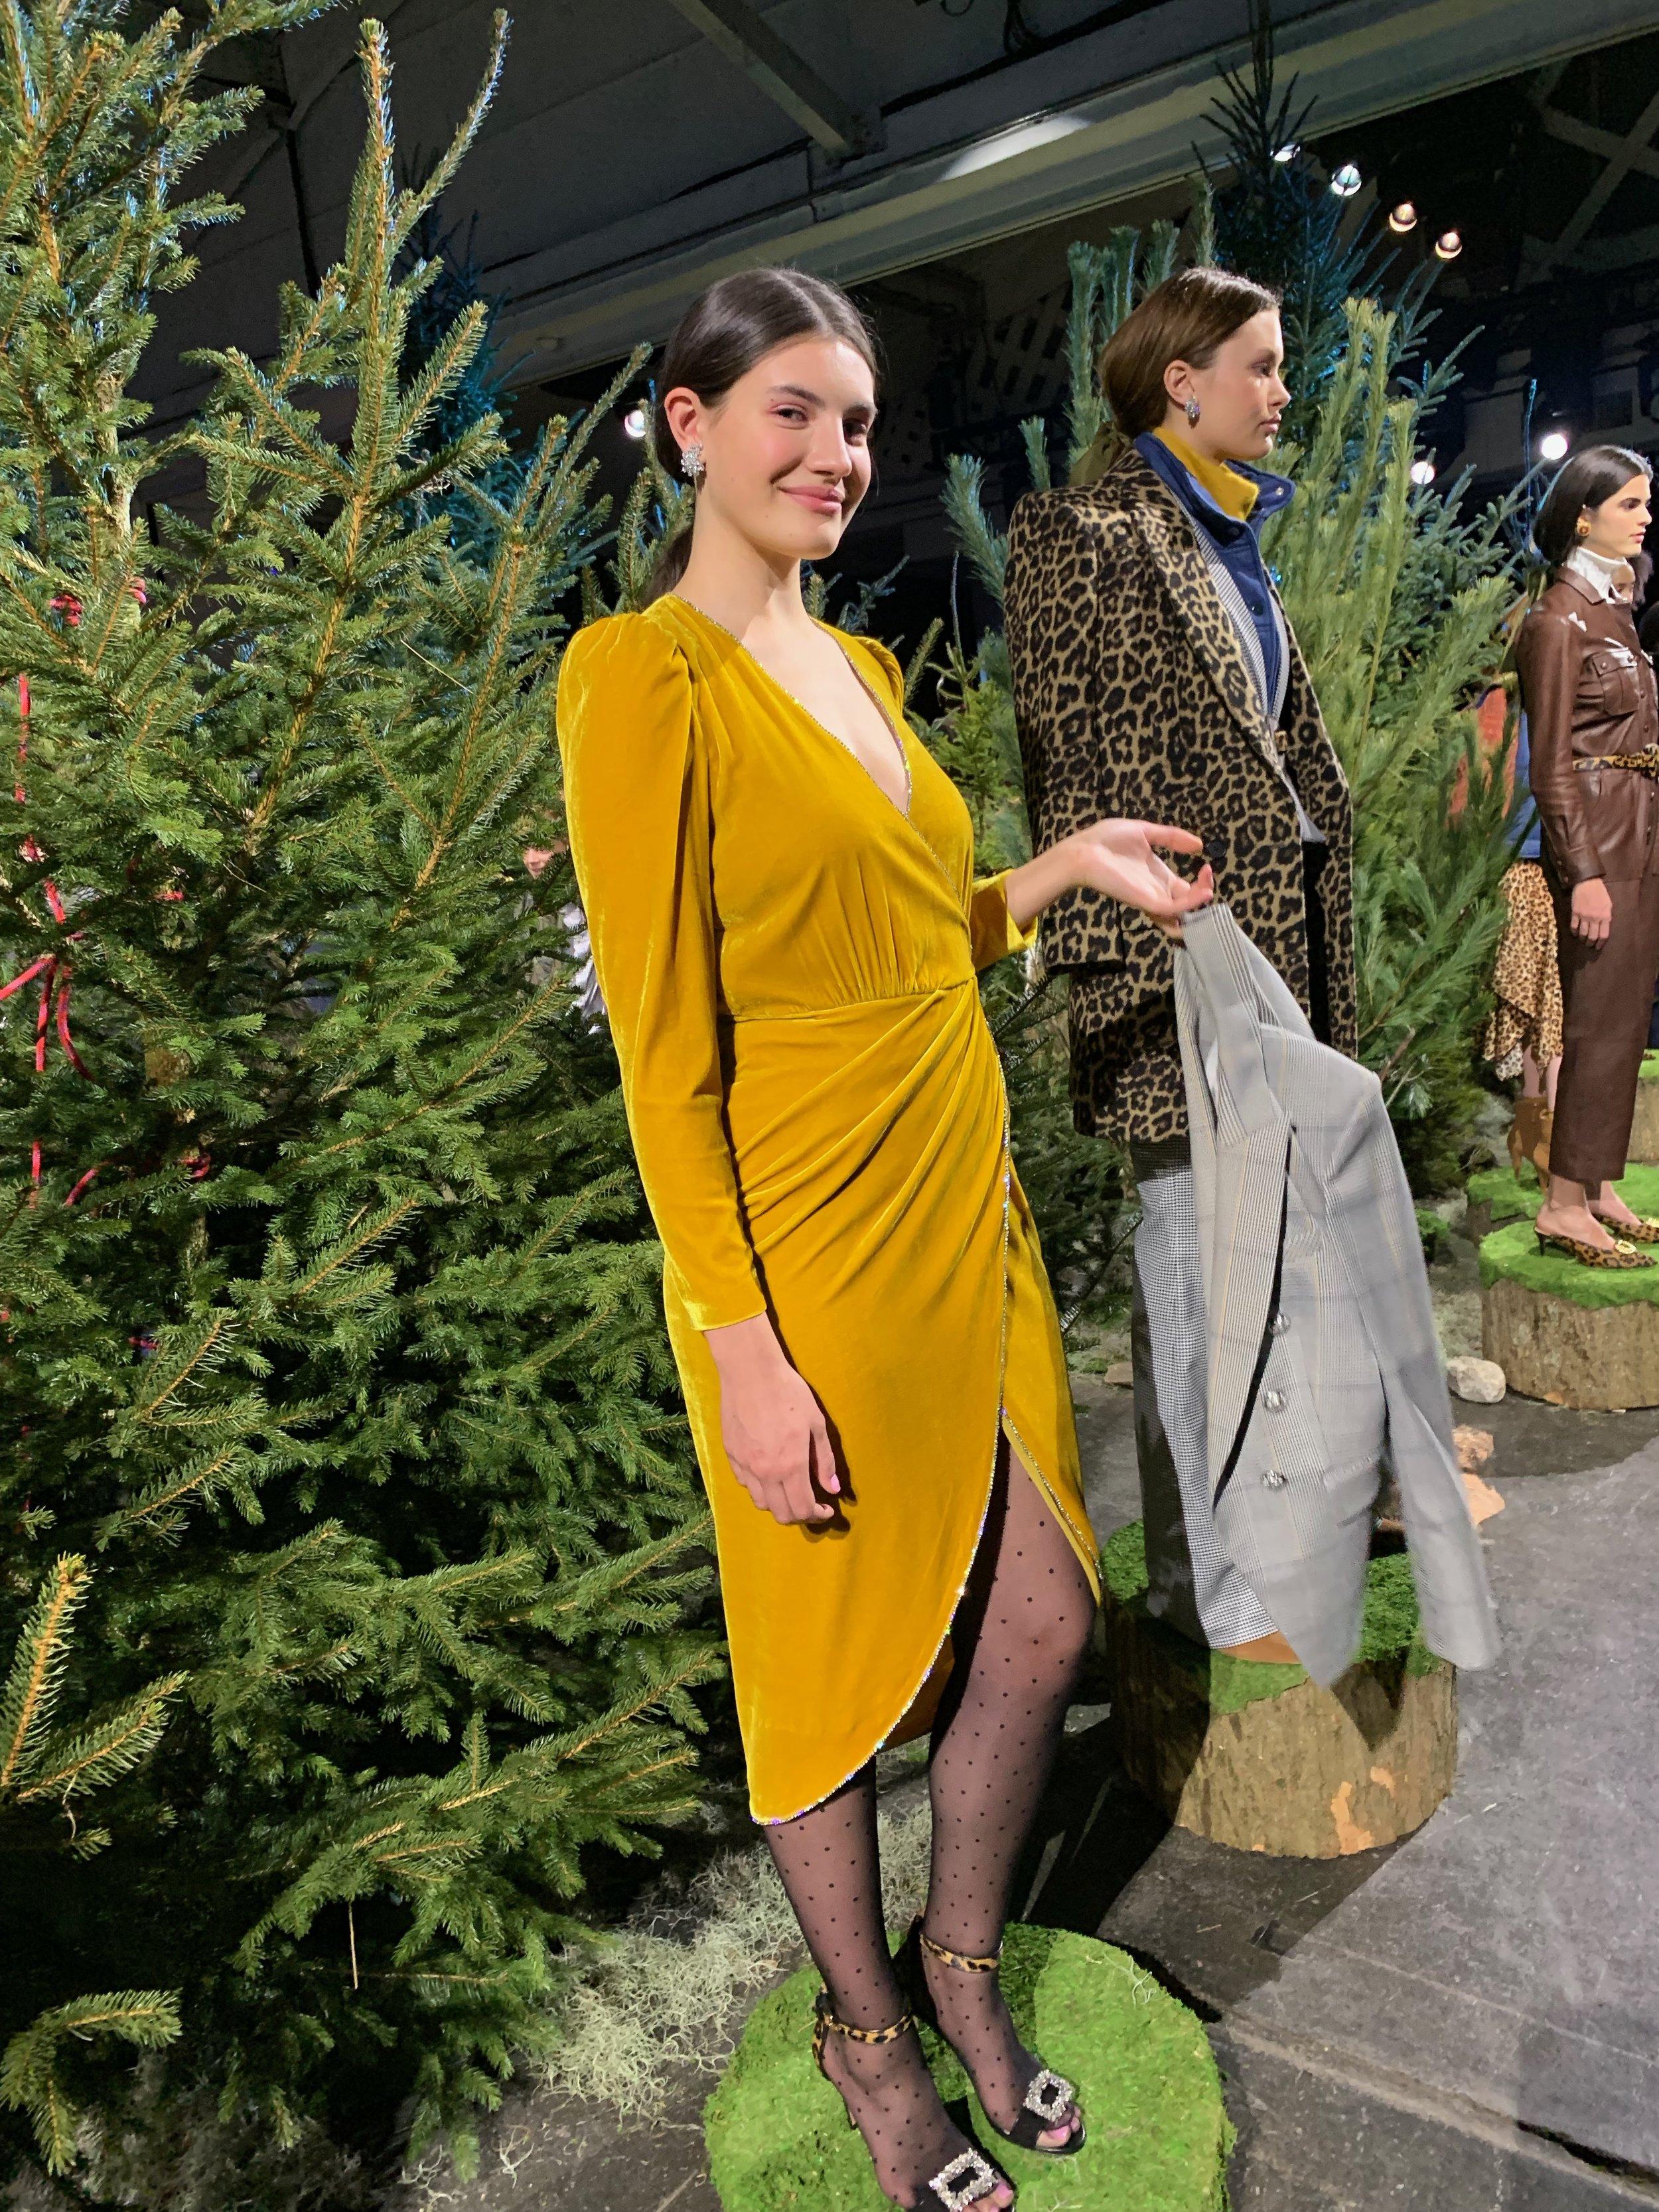 Model is wearing: Yellow ANTHEA Dress, Plaid MILLER Dickey Jacket, Black TARAN Mules